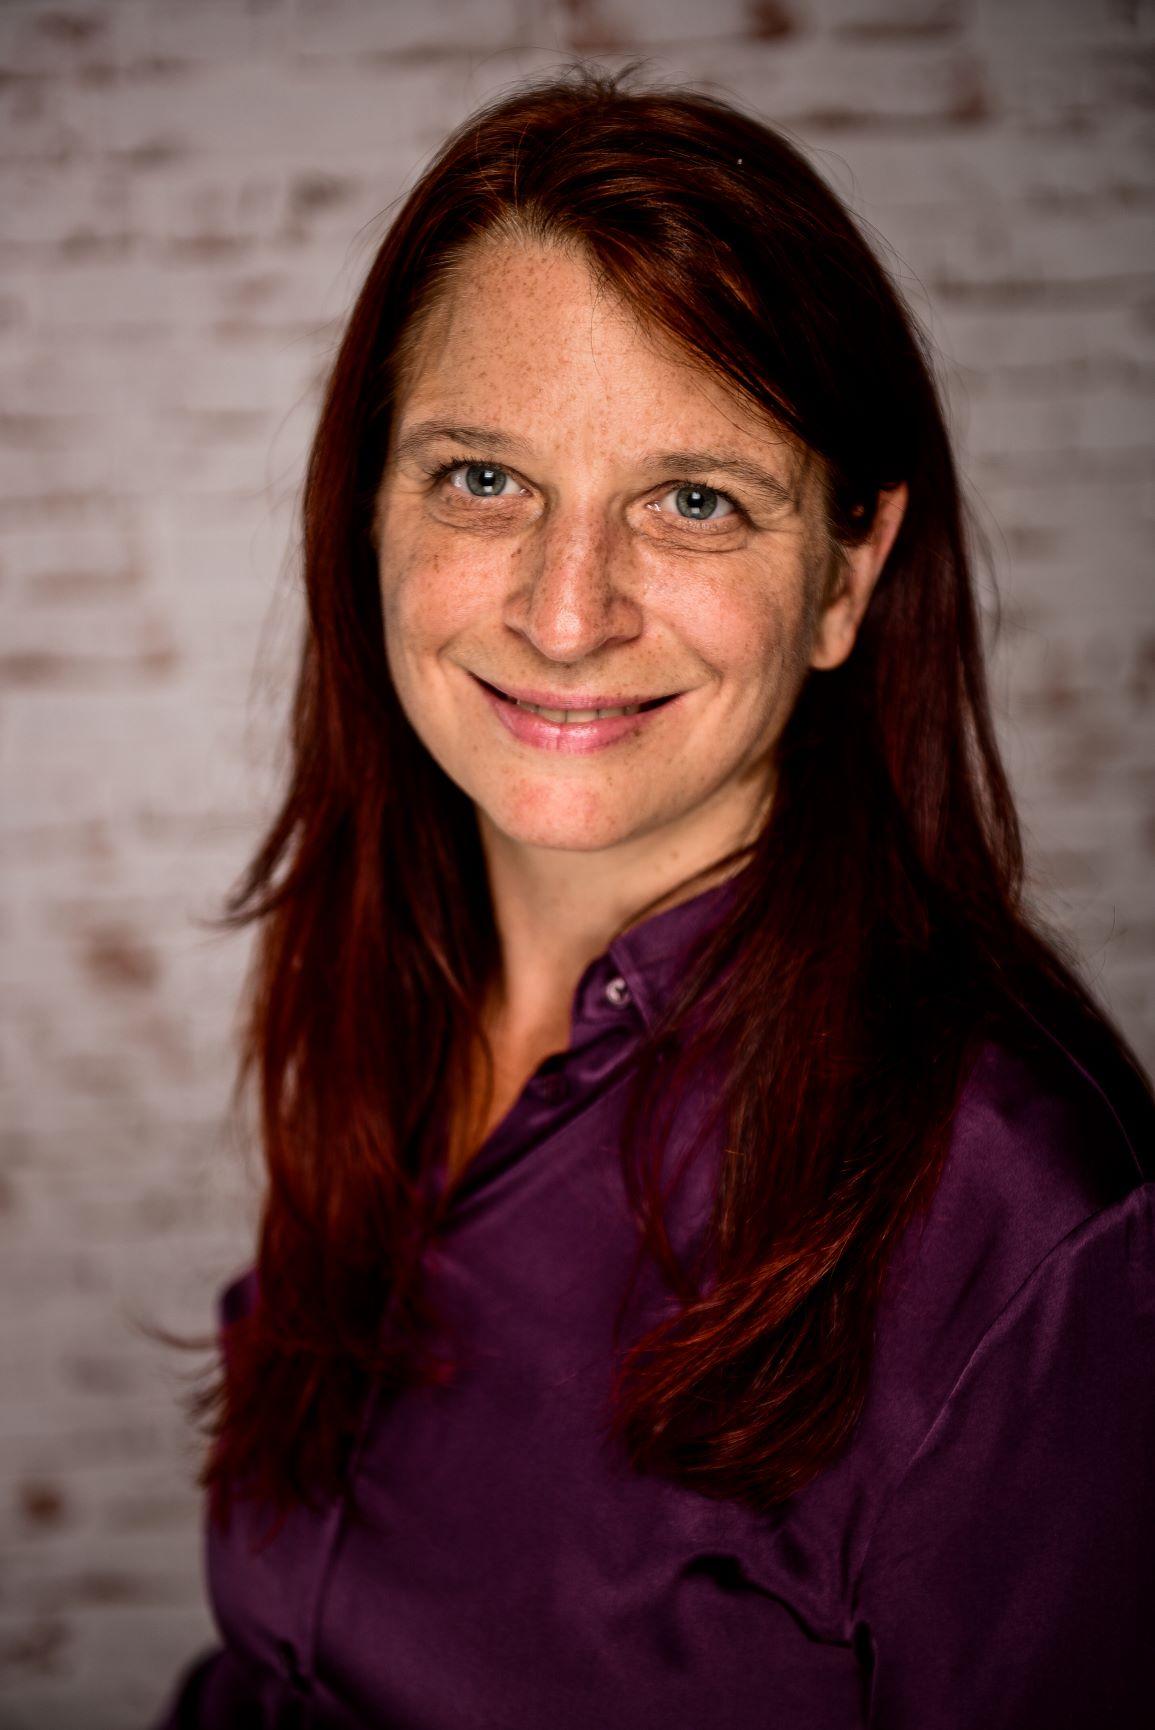 Evelyn Schober-Safian